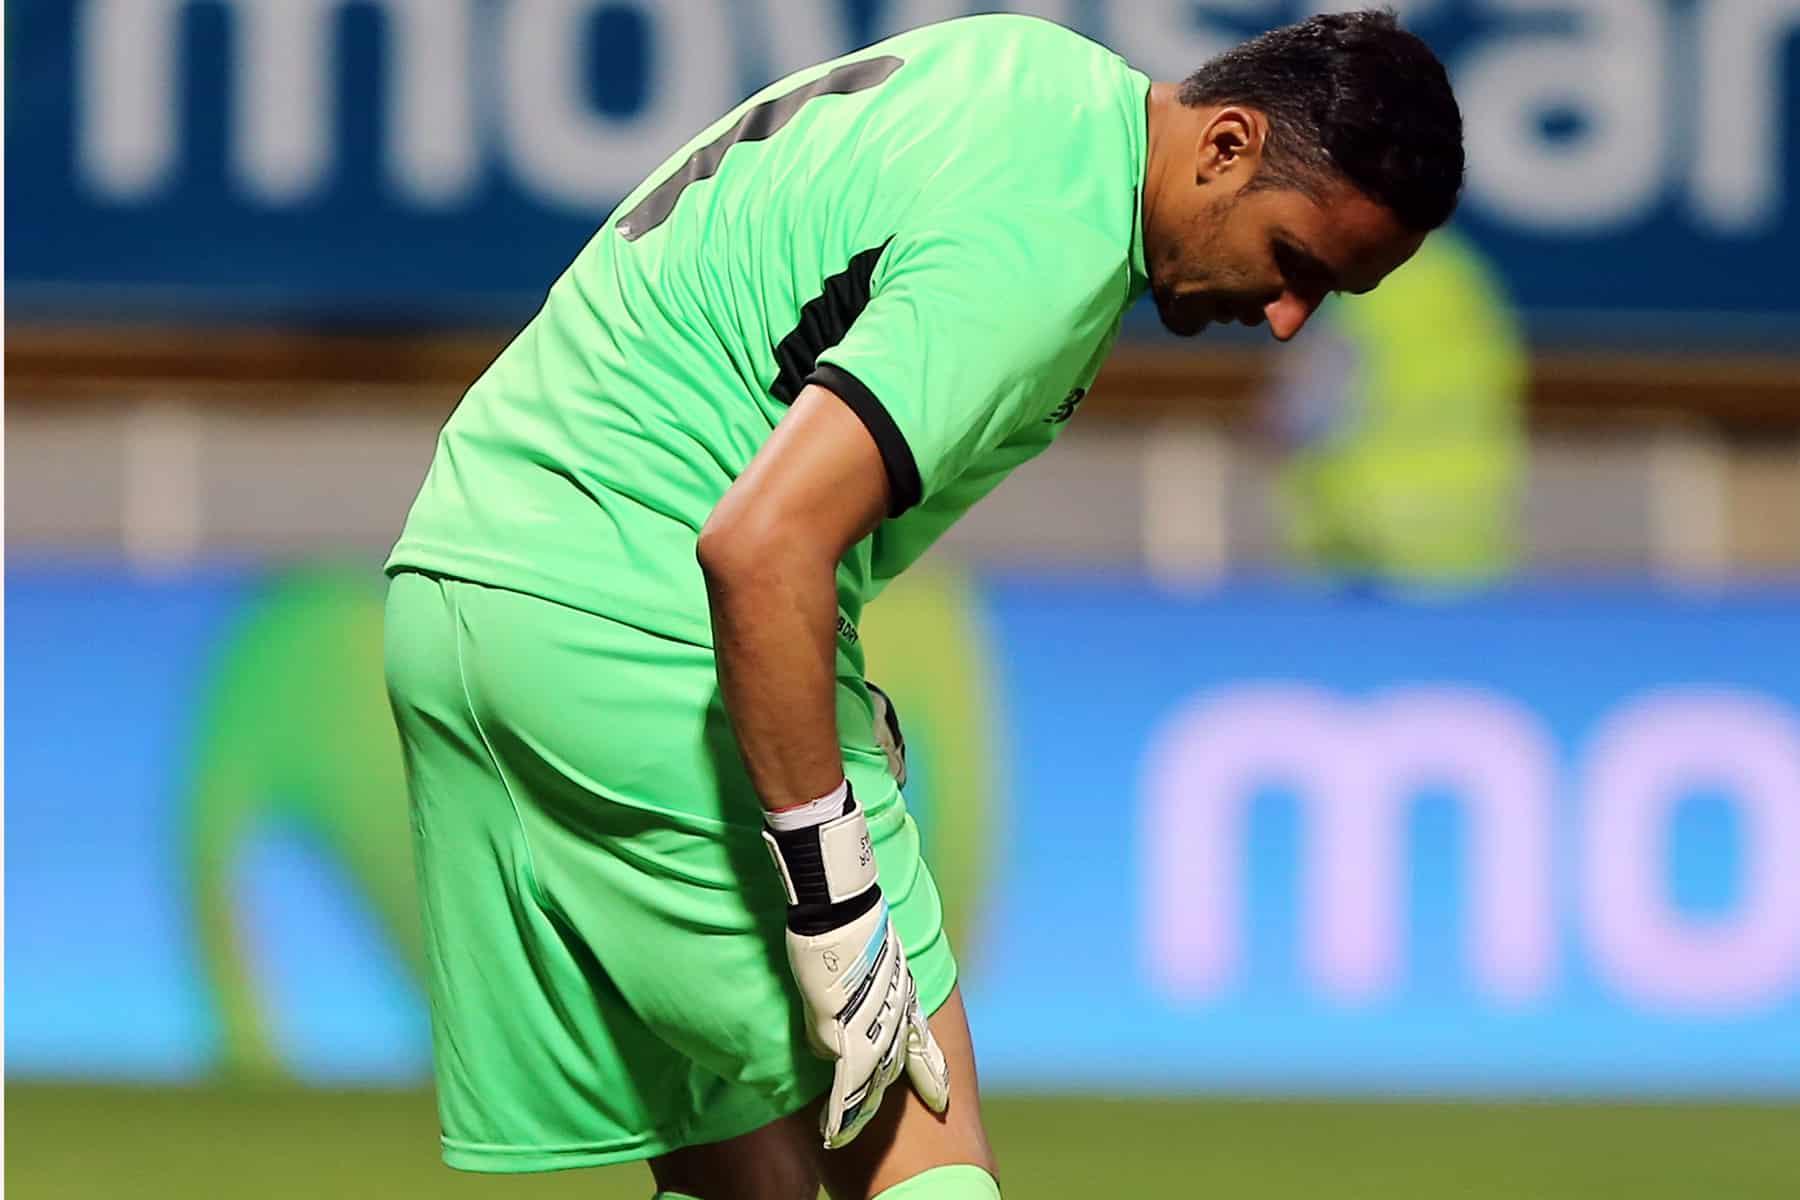 Costa Rica's goalkeeper Keylor Navas